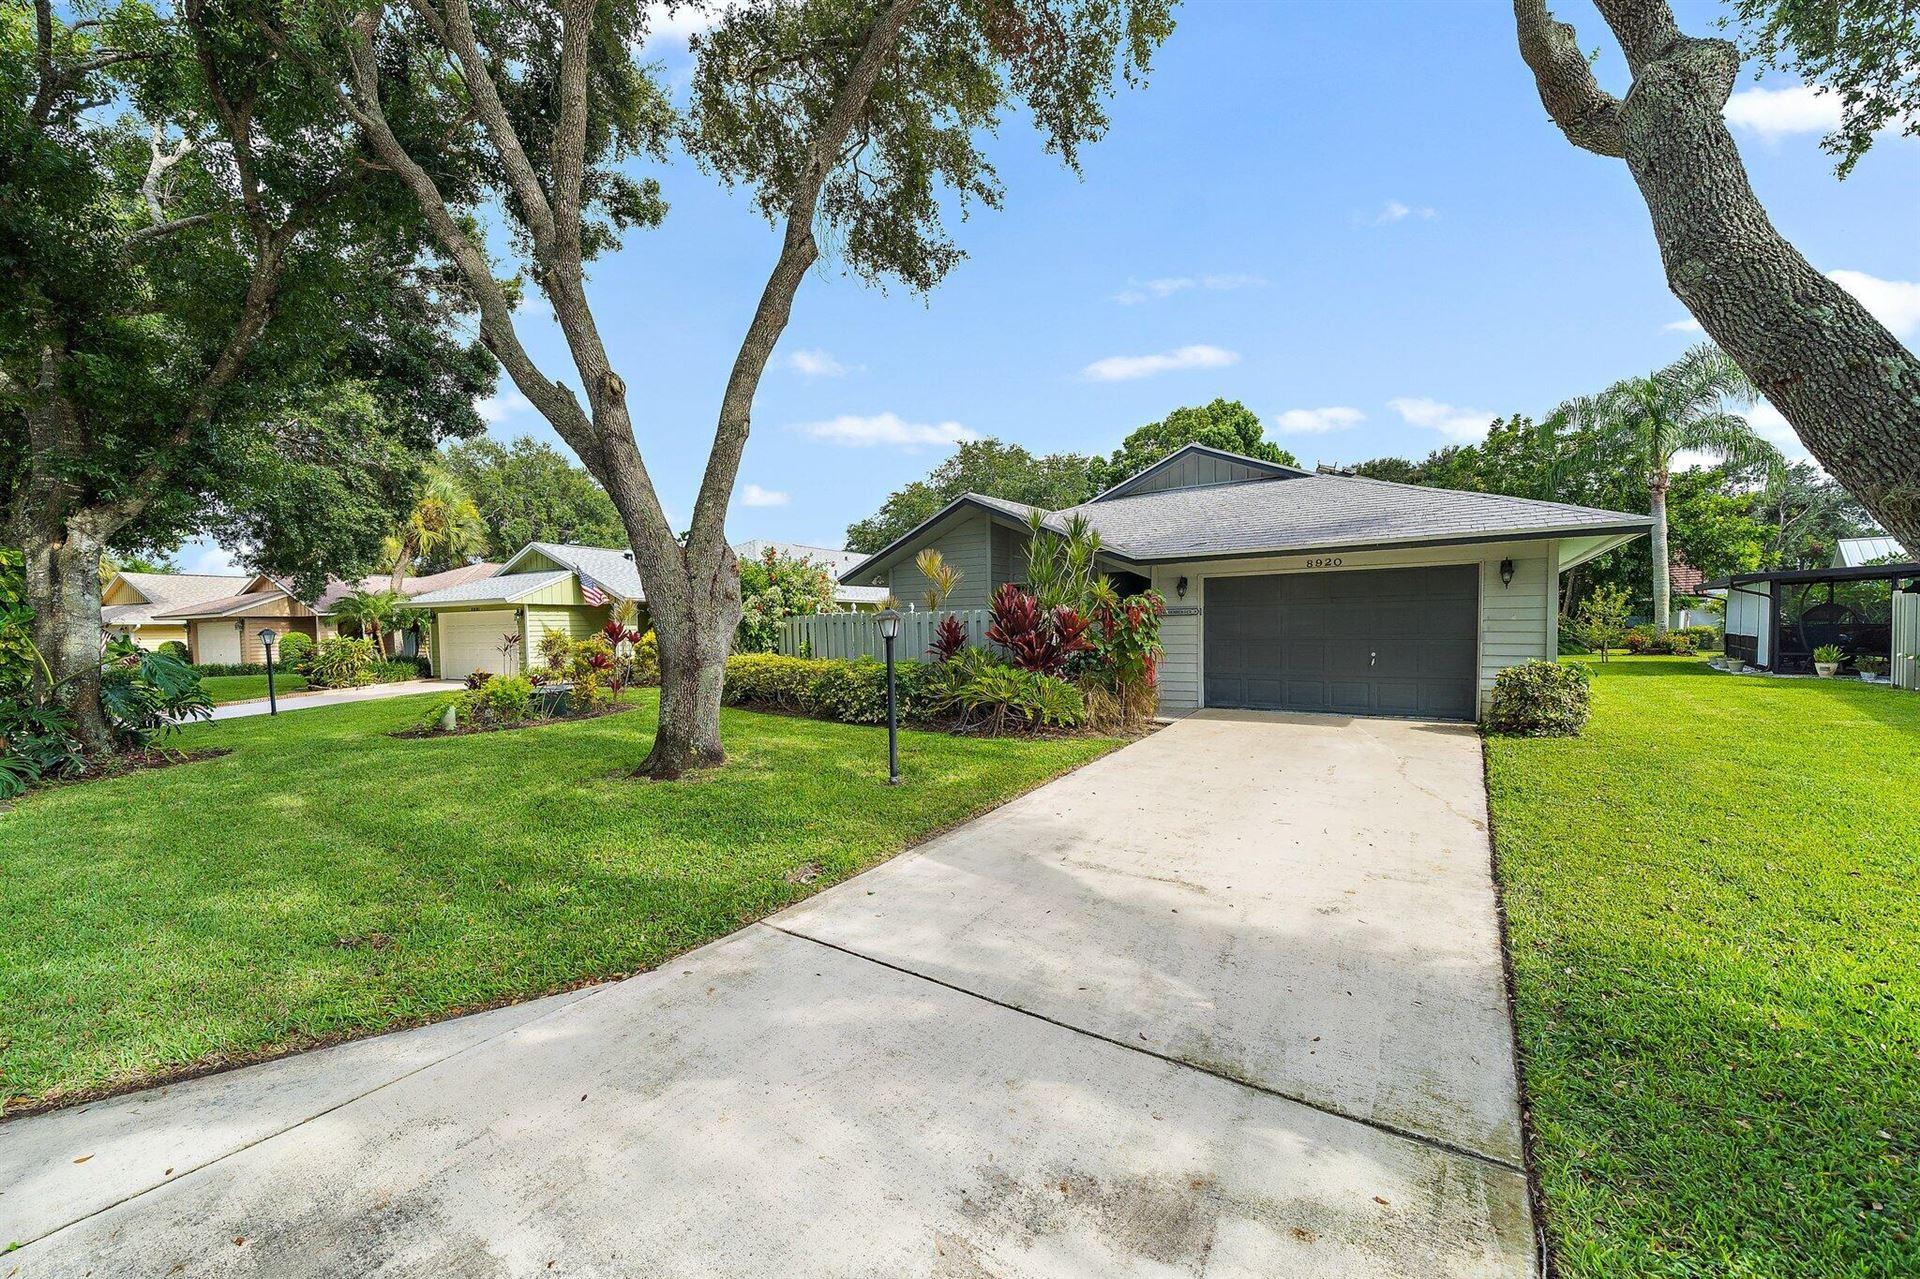 Photo of 8920 SE Eaglewood Way, Hobe Sound, FL 33455 (MLS # RX-10744048)